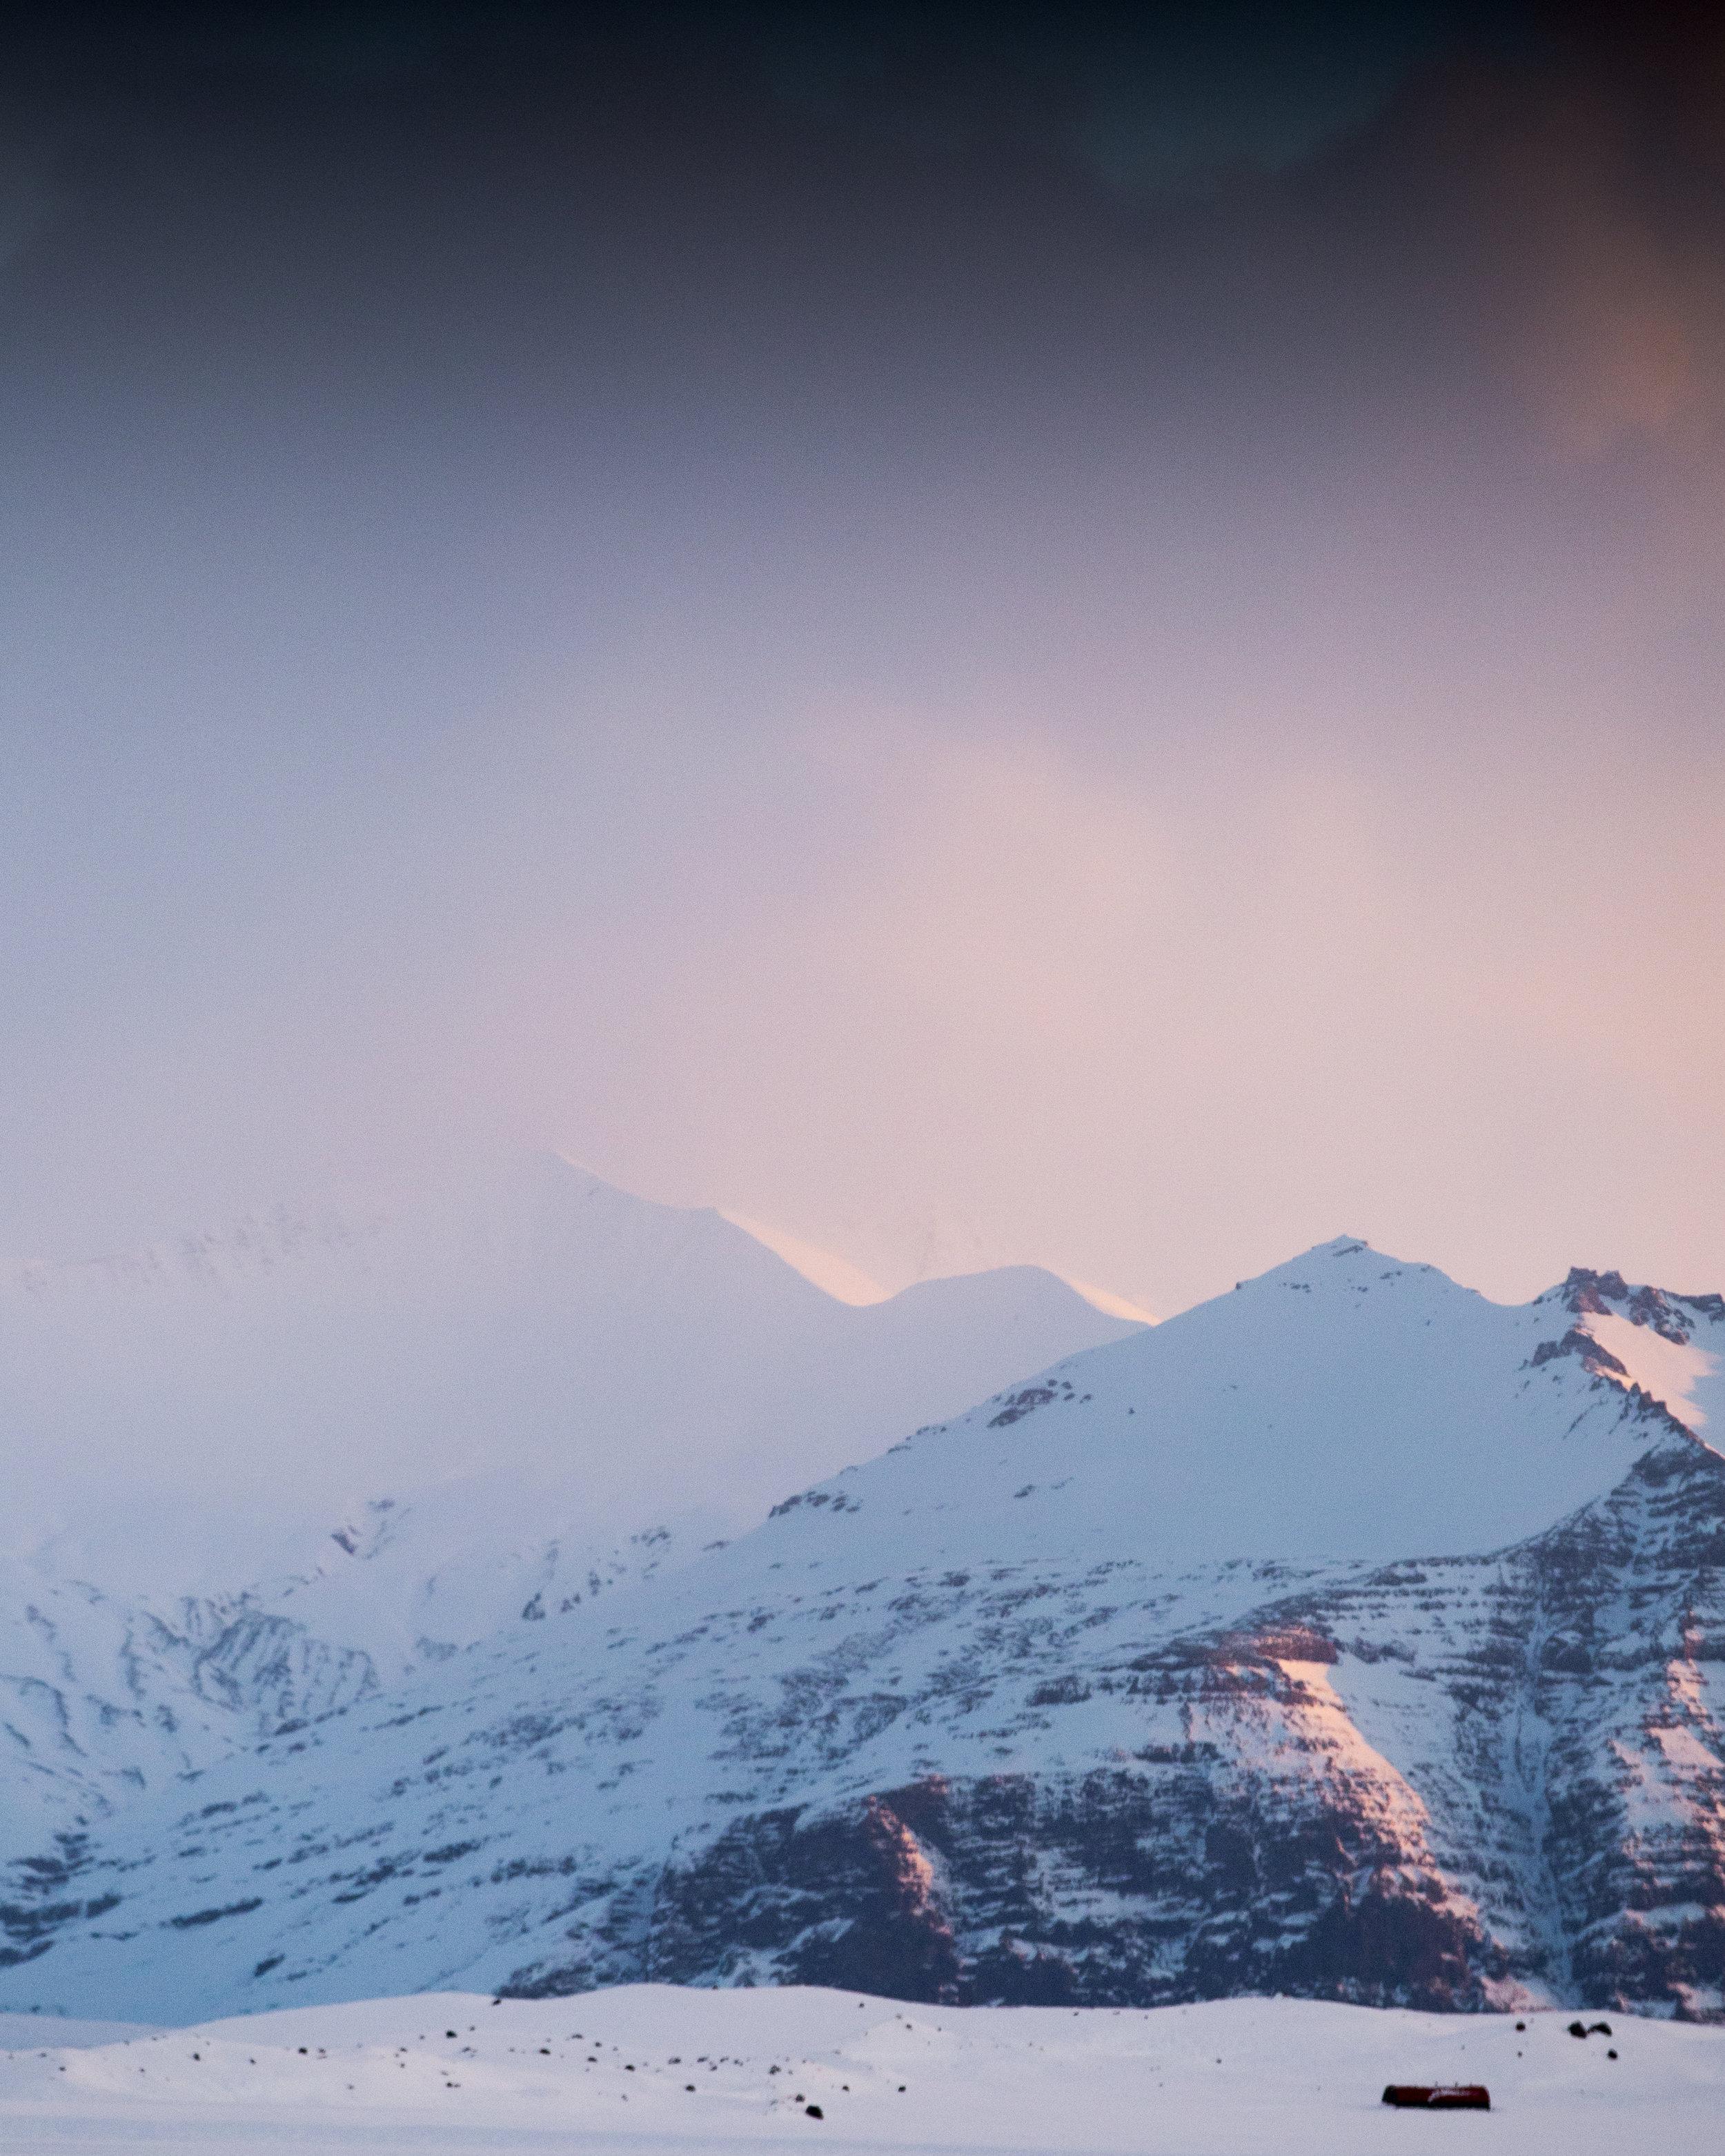 jermiah-schuster-iceland-400_01.jpg